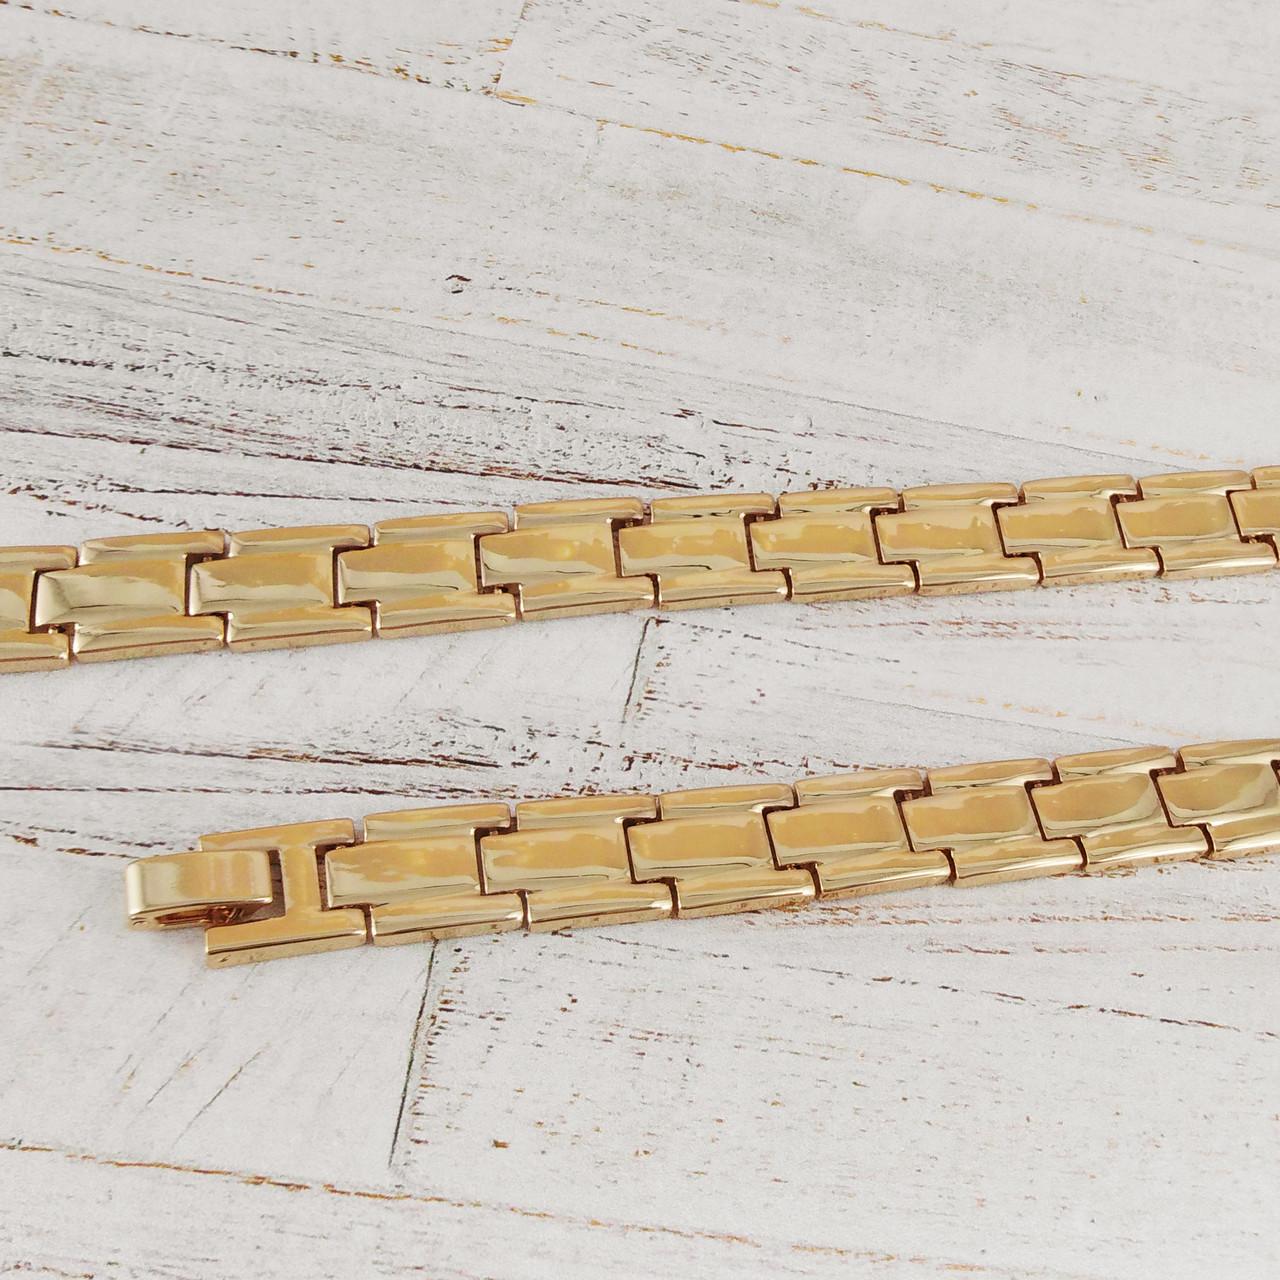 Браслет Xuping Jewelry 19 см х 10,5 мм Браслетное плетение, медицинское золото, позолота 18К. А/В 3331